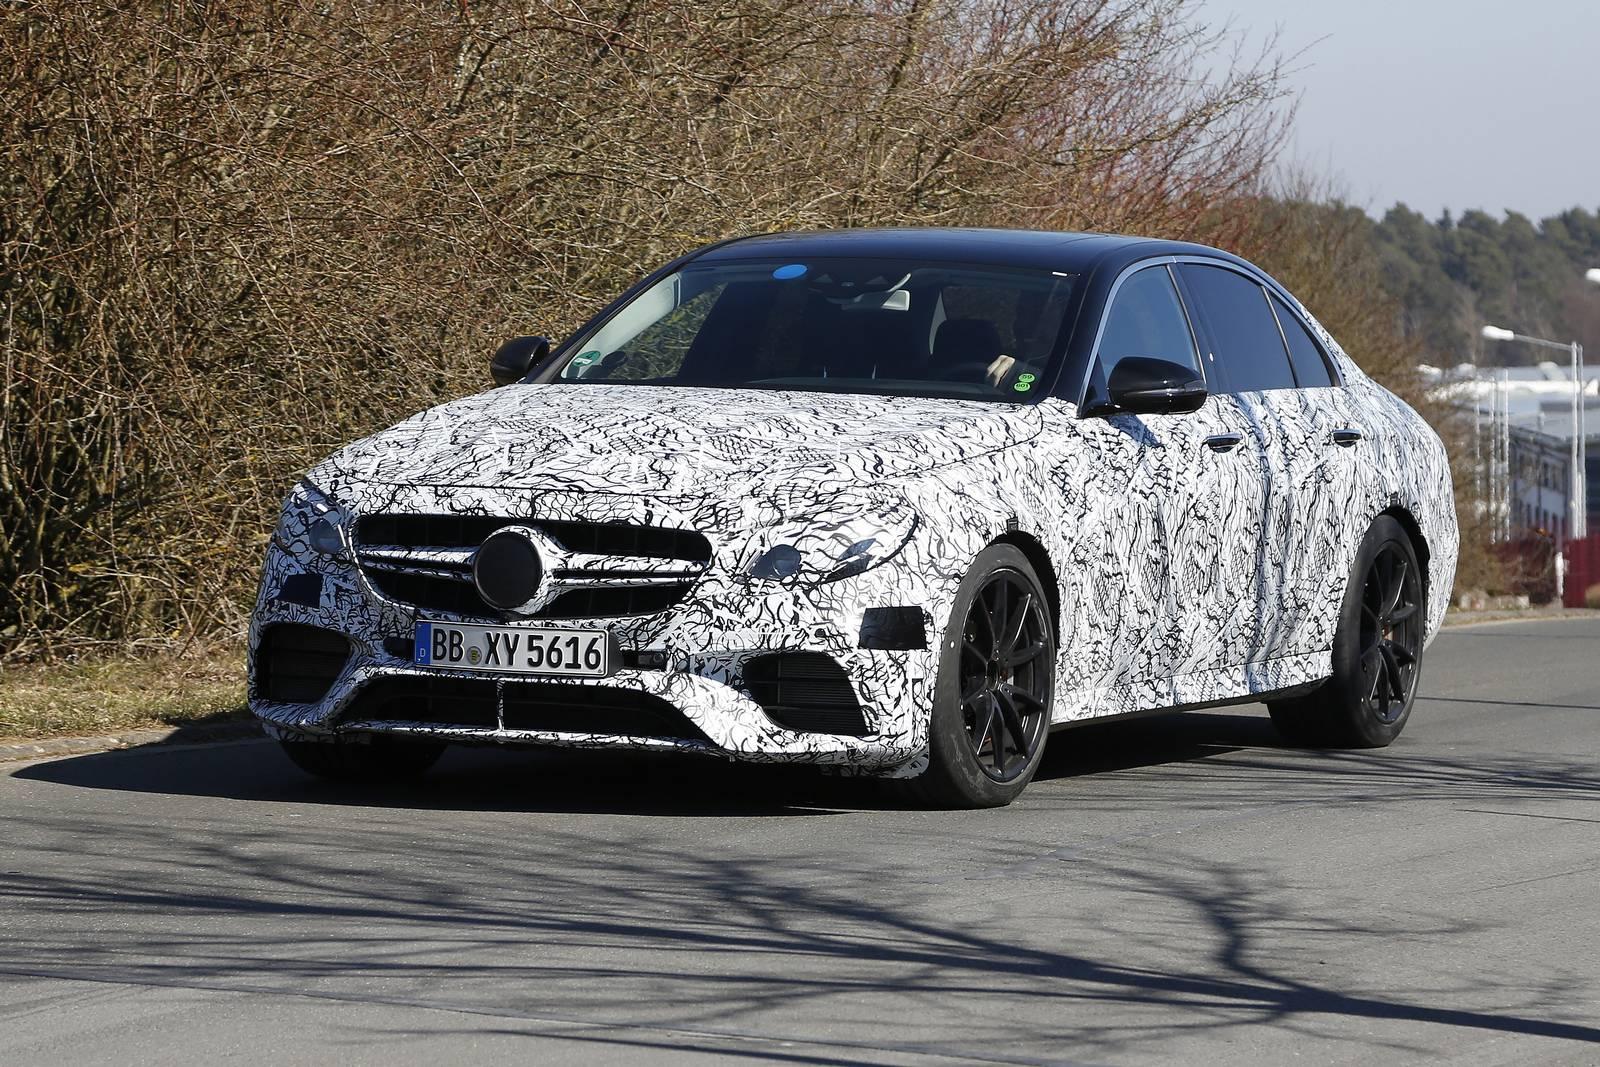 2018 mercedes amg e63 estate and sedan new spy shots for Mercedes benz e63 amg 2018